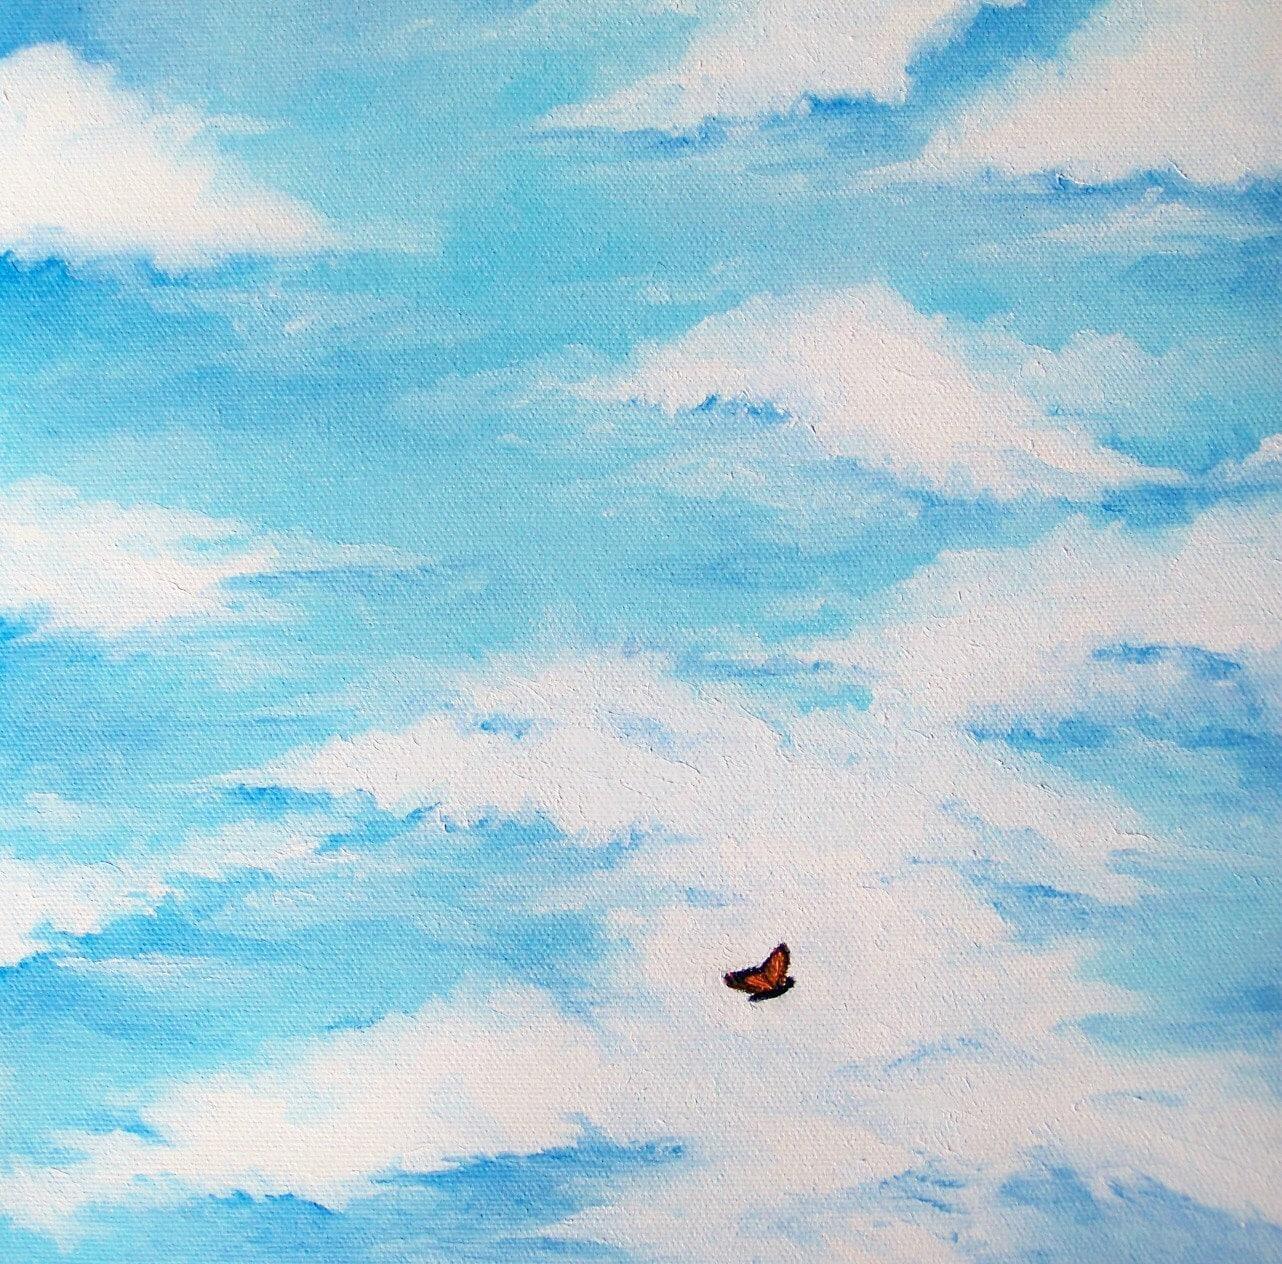 Butterflies flying in formation